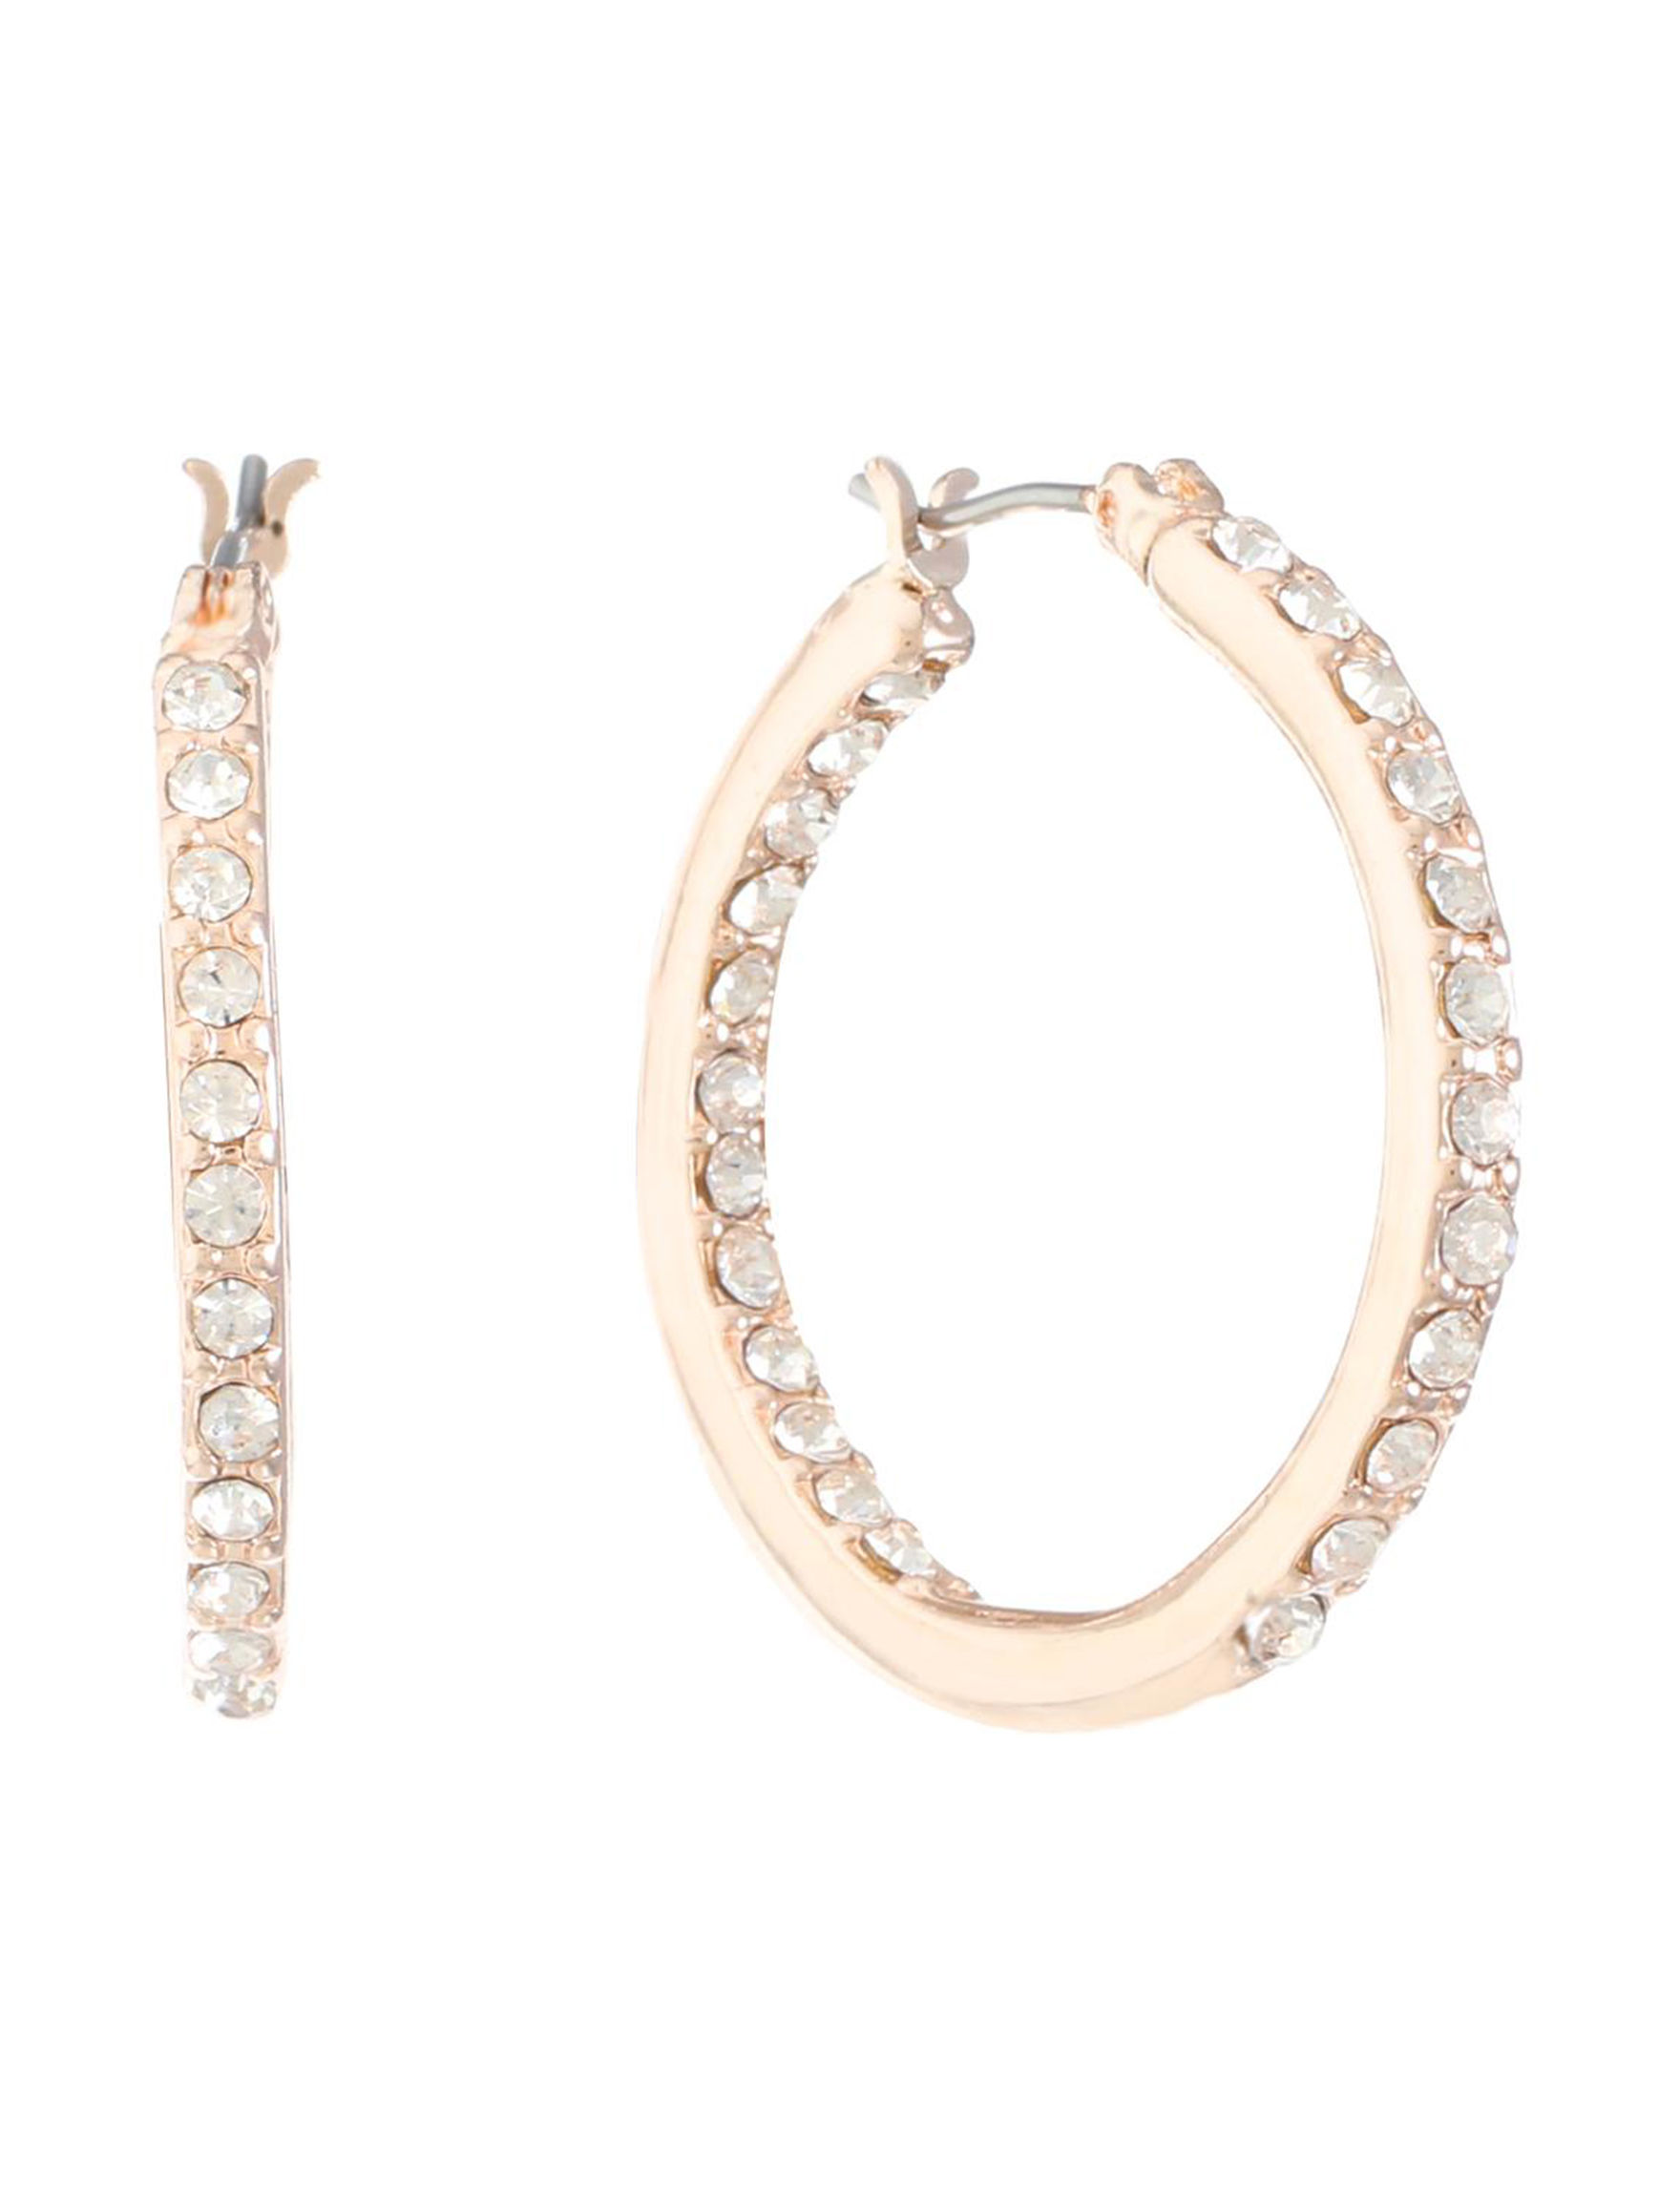 Gloria Vanderbilt Rose Gold Hoops Earrings Fashion Jewelry